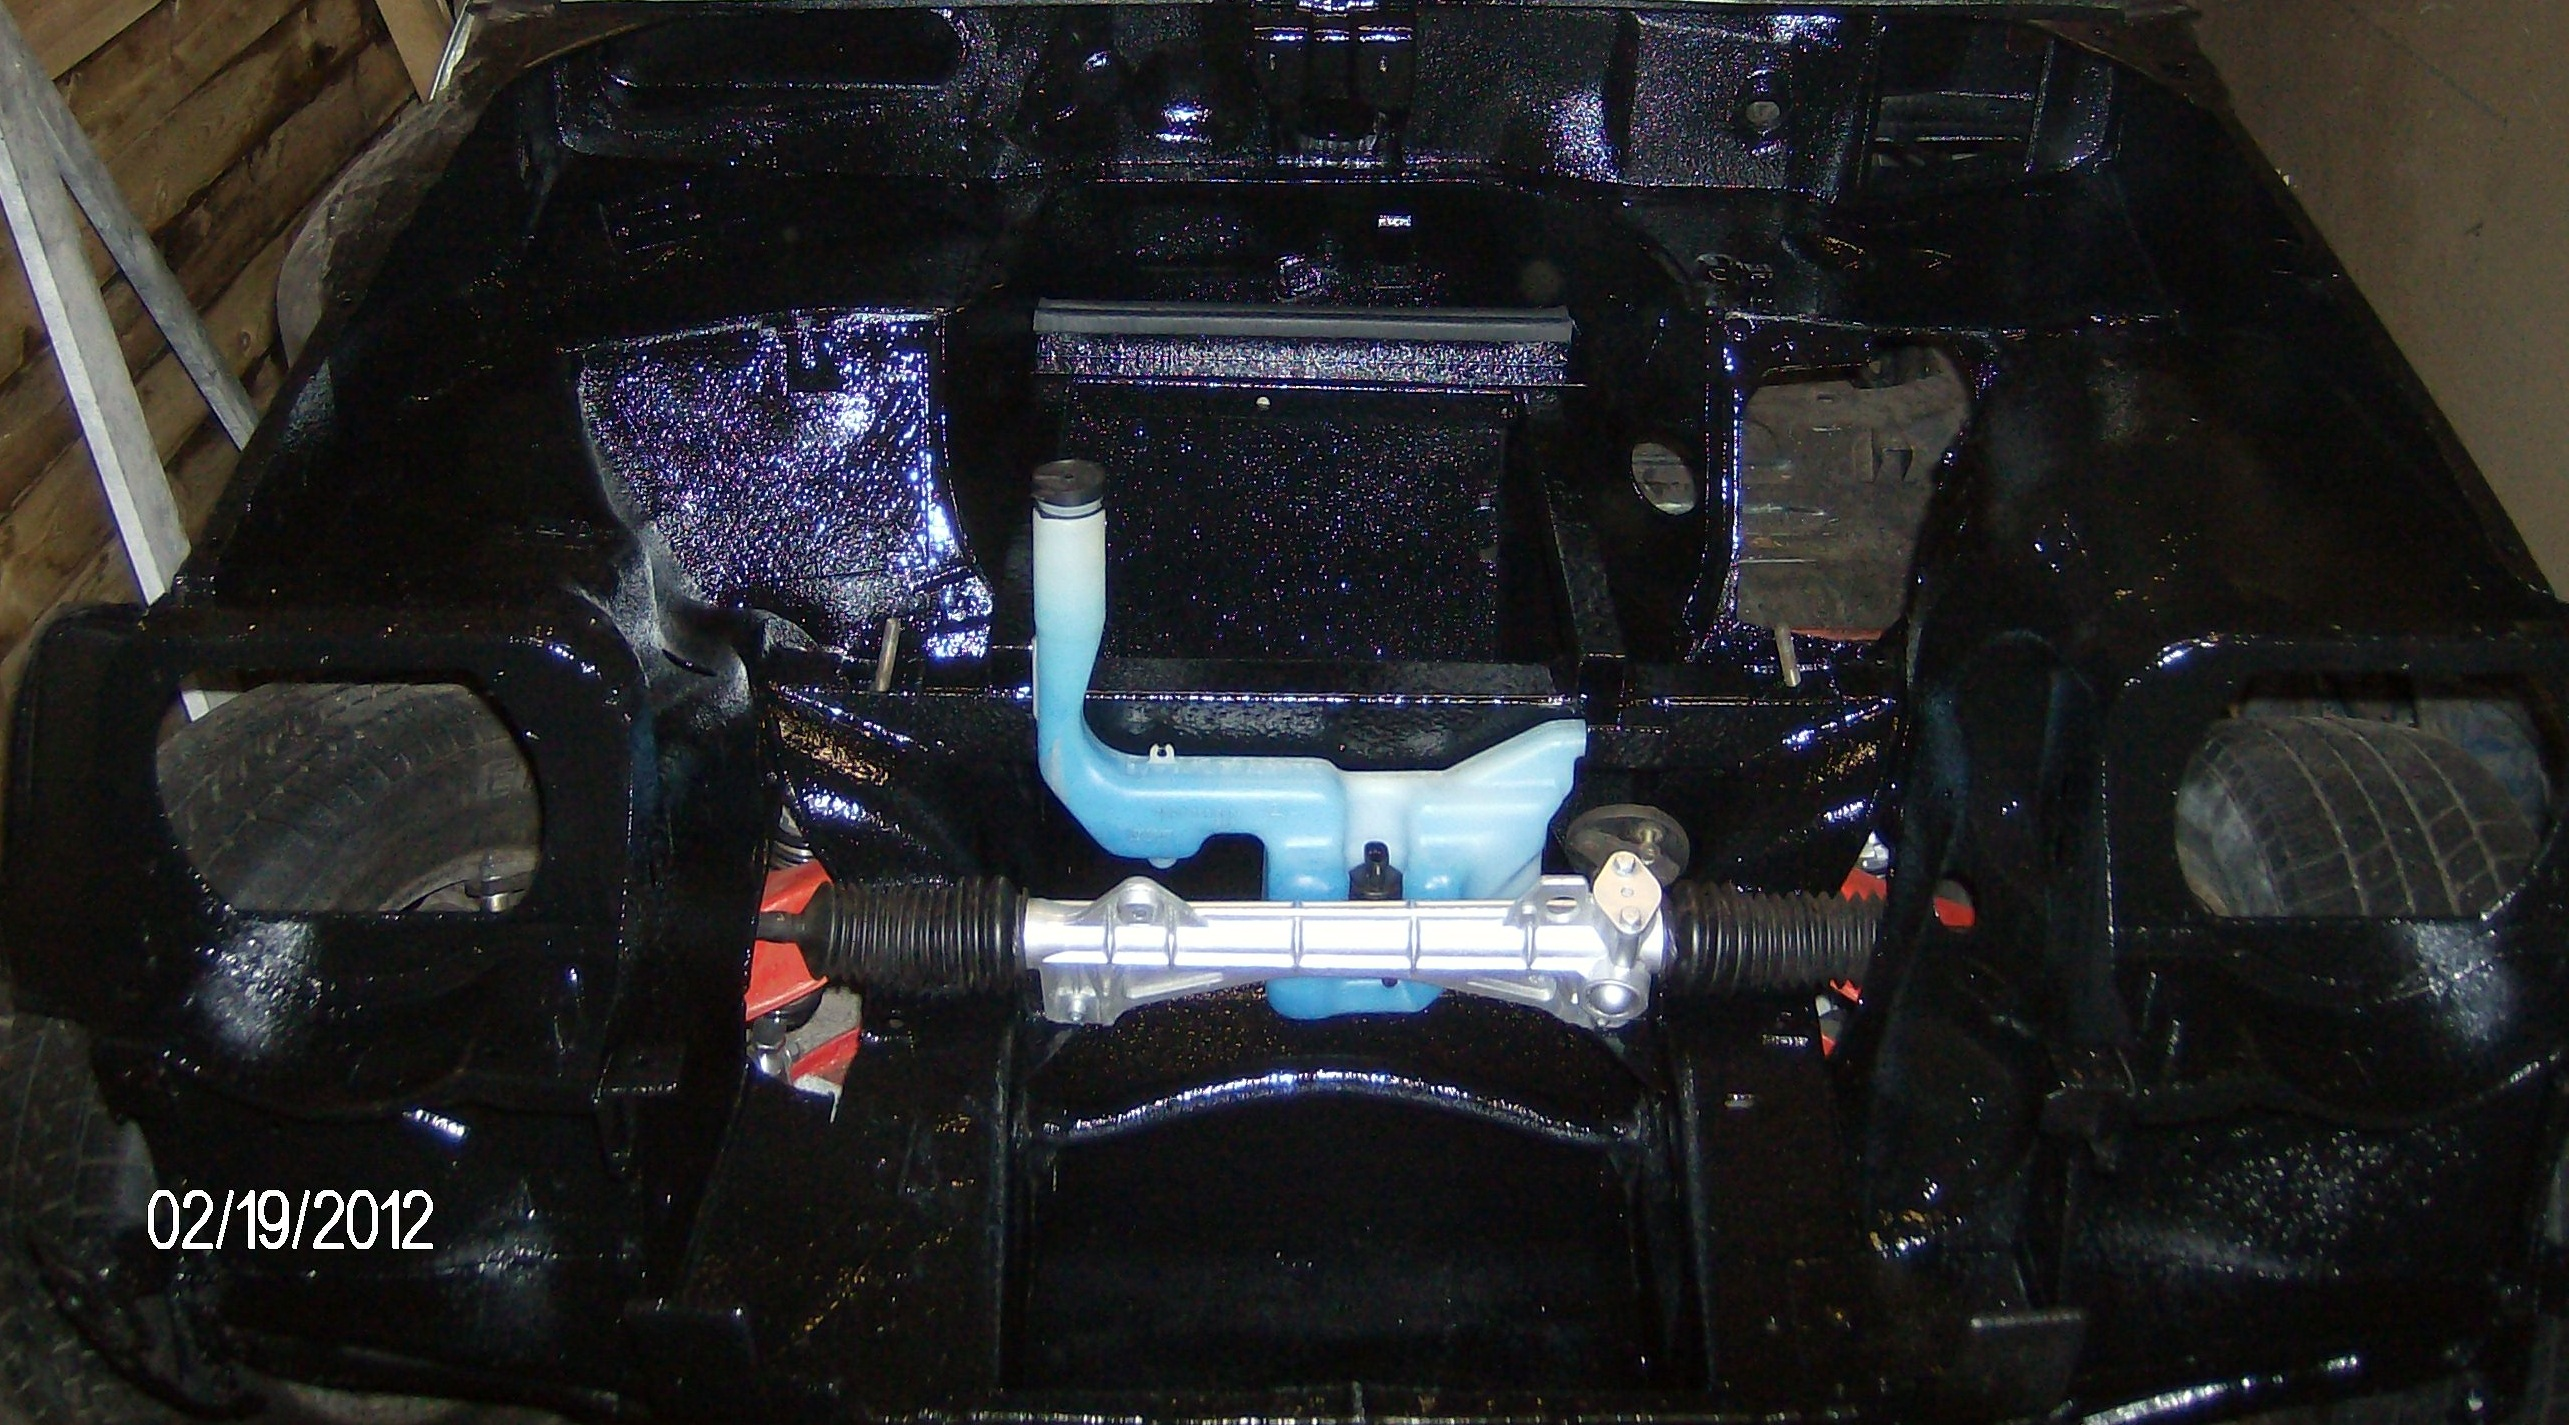 Replique renault 5 turbo - Page 6 602545HPIM2255